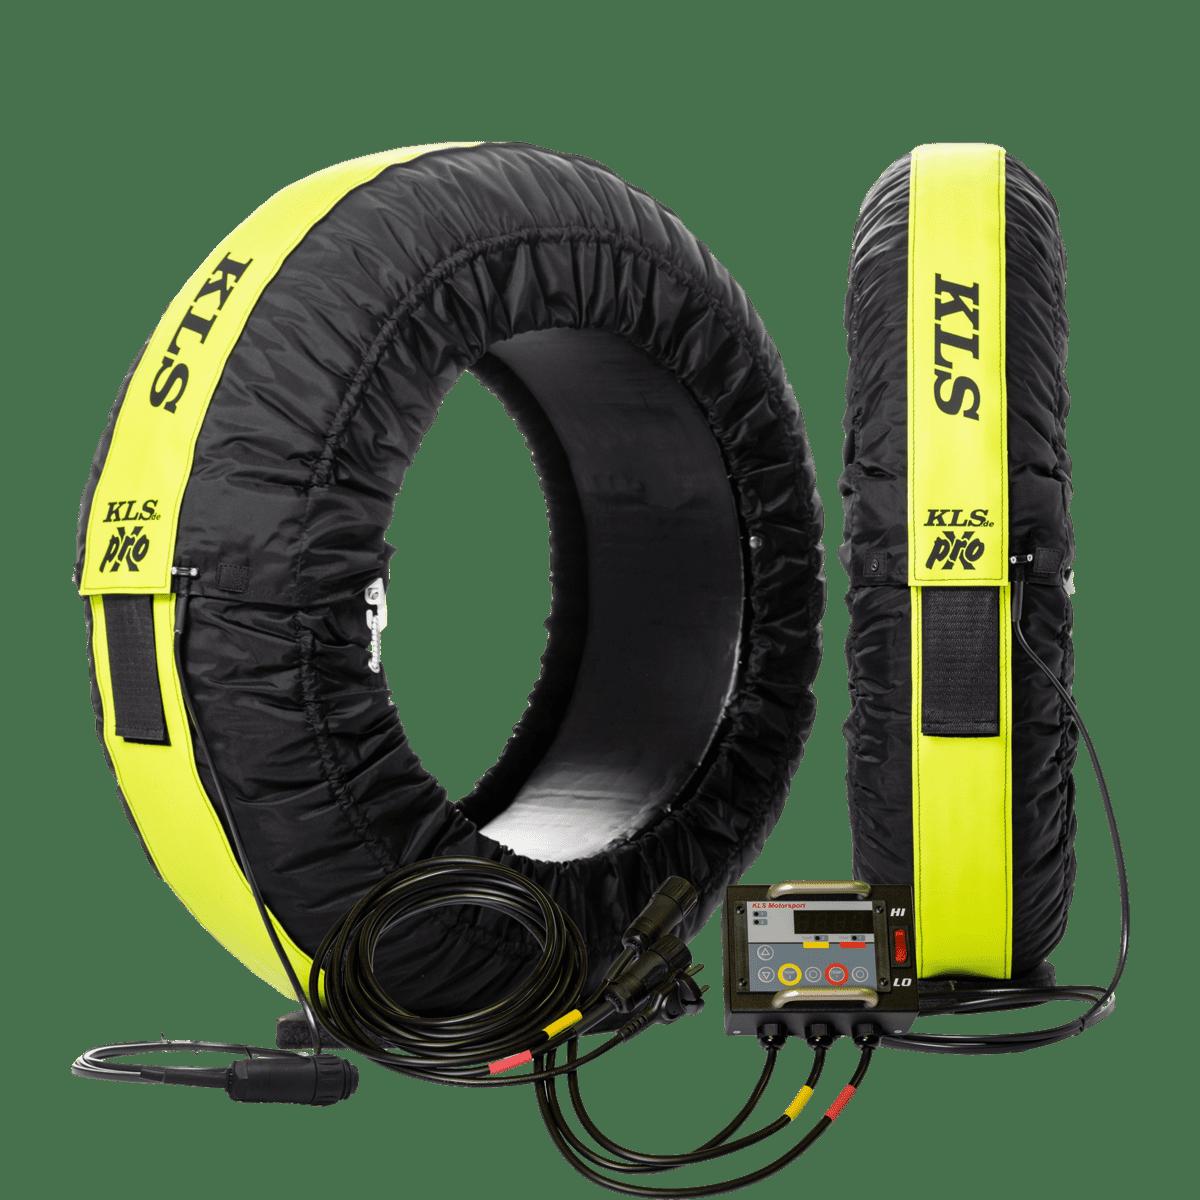 kls-reifenwaermer-moto-prox-tcu--1200x1200